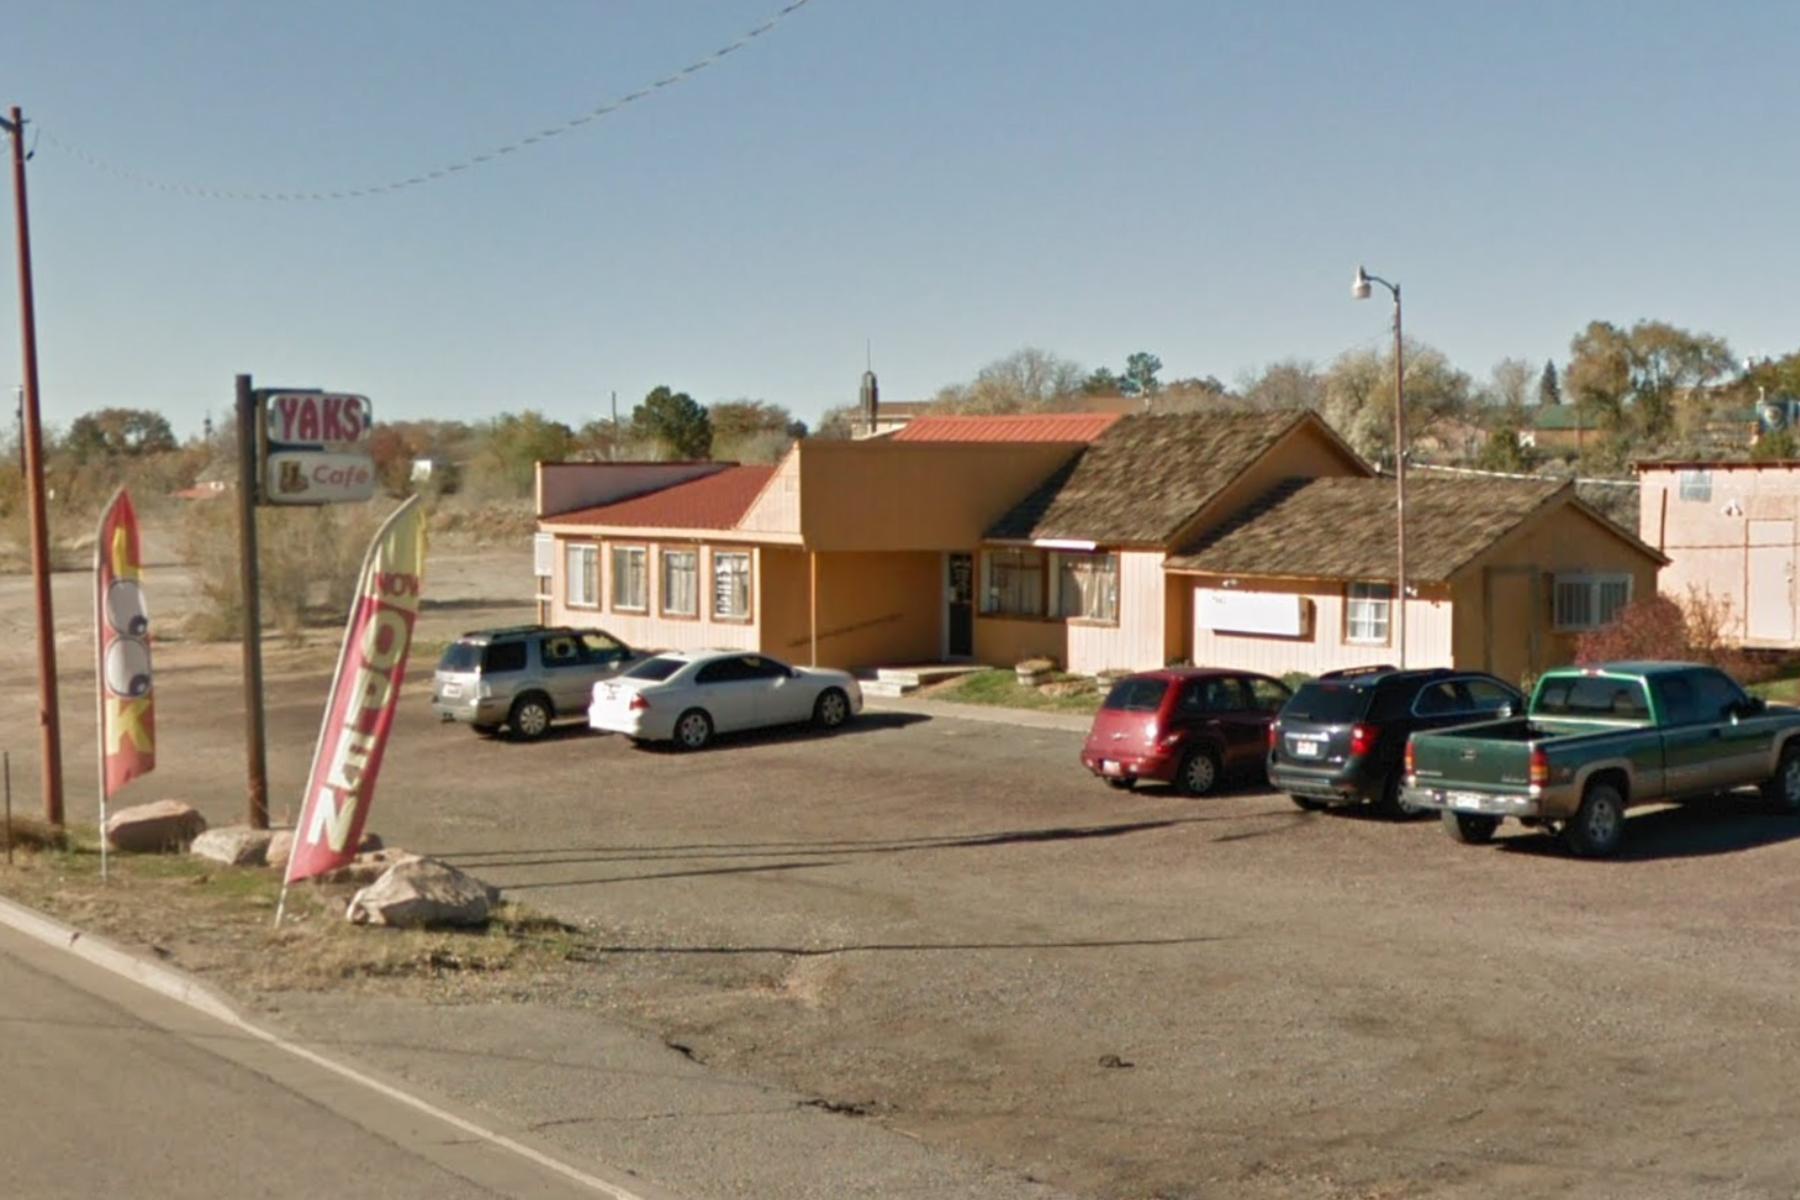 Utah restaurant bans masks as COVID cases in state skyrocket